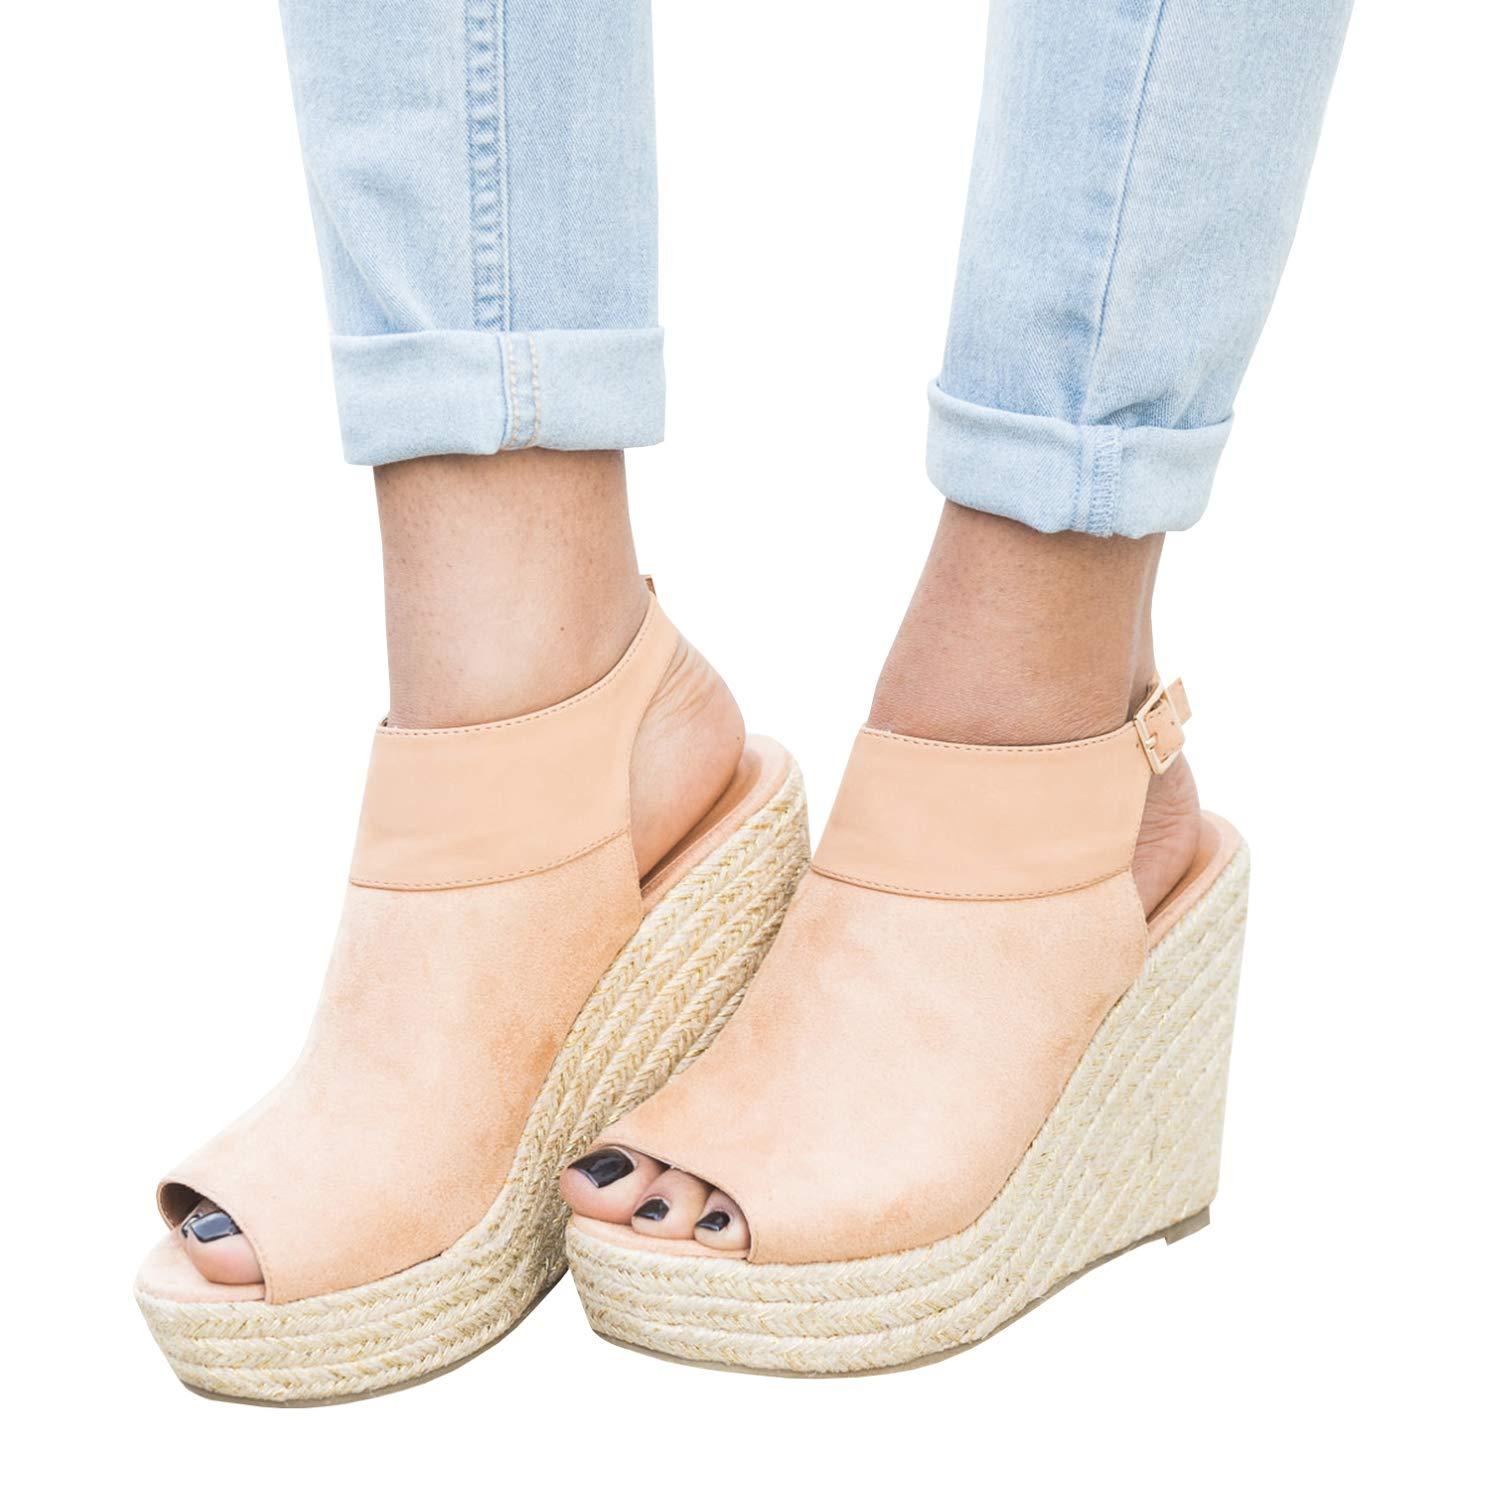 Meilidress Womens Platform Wedge Sandals Suede Peep Toe Ankle Strap Buckle Espadrille Shoes